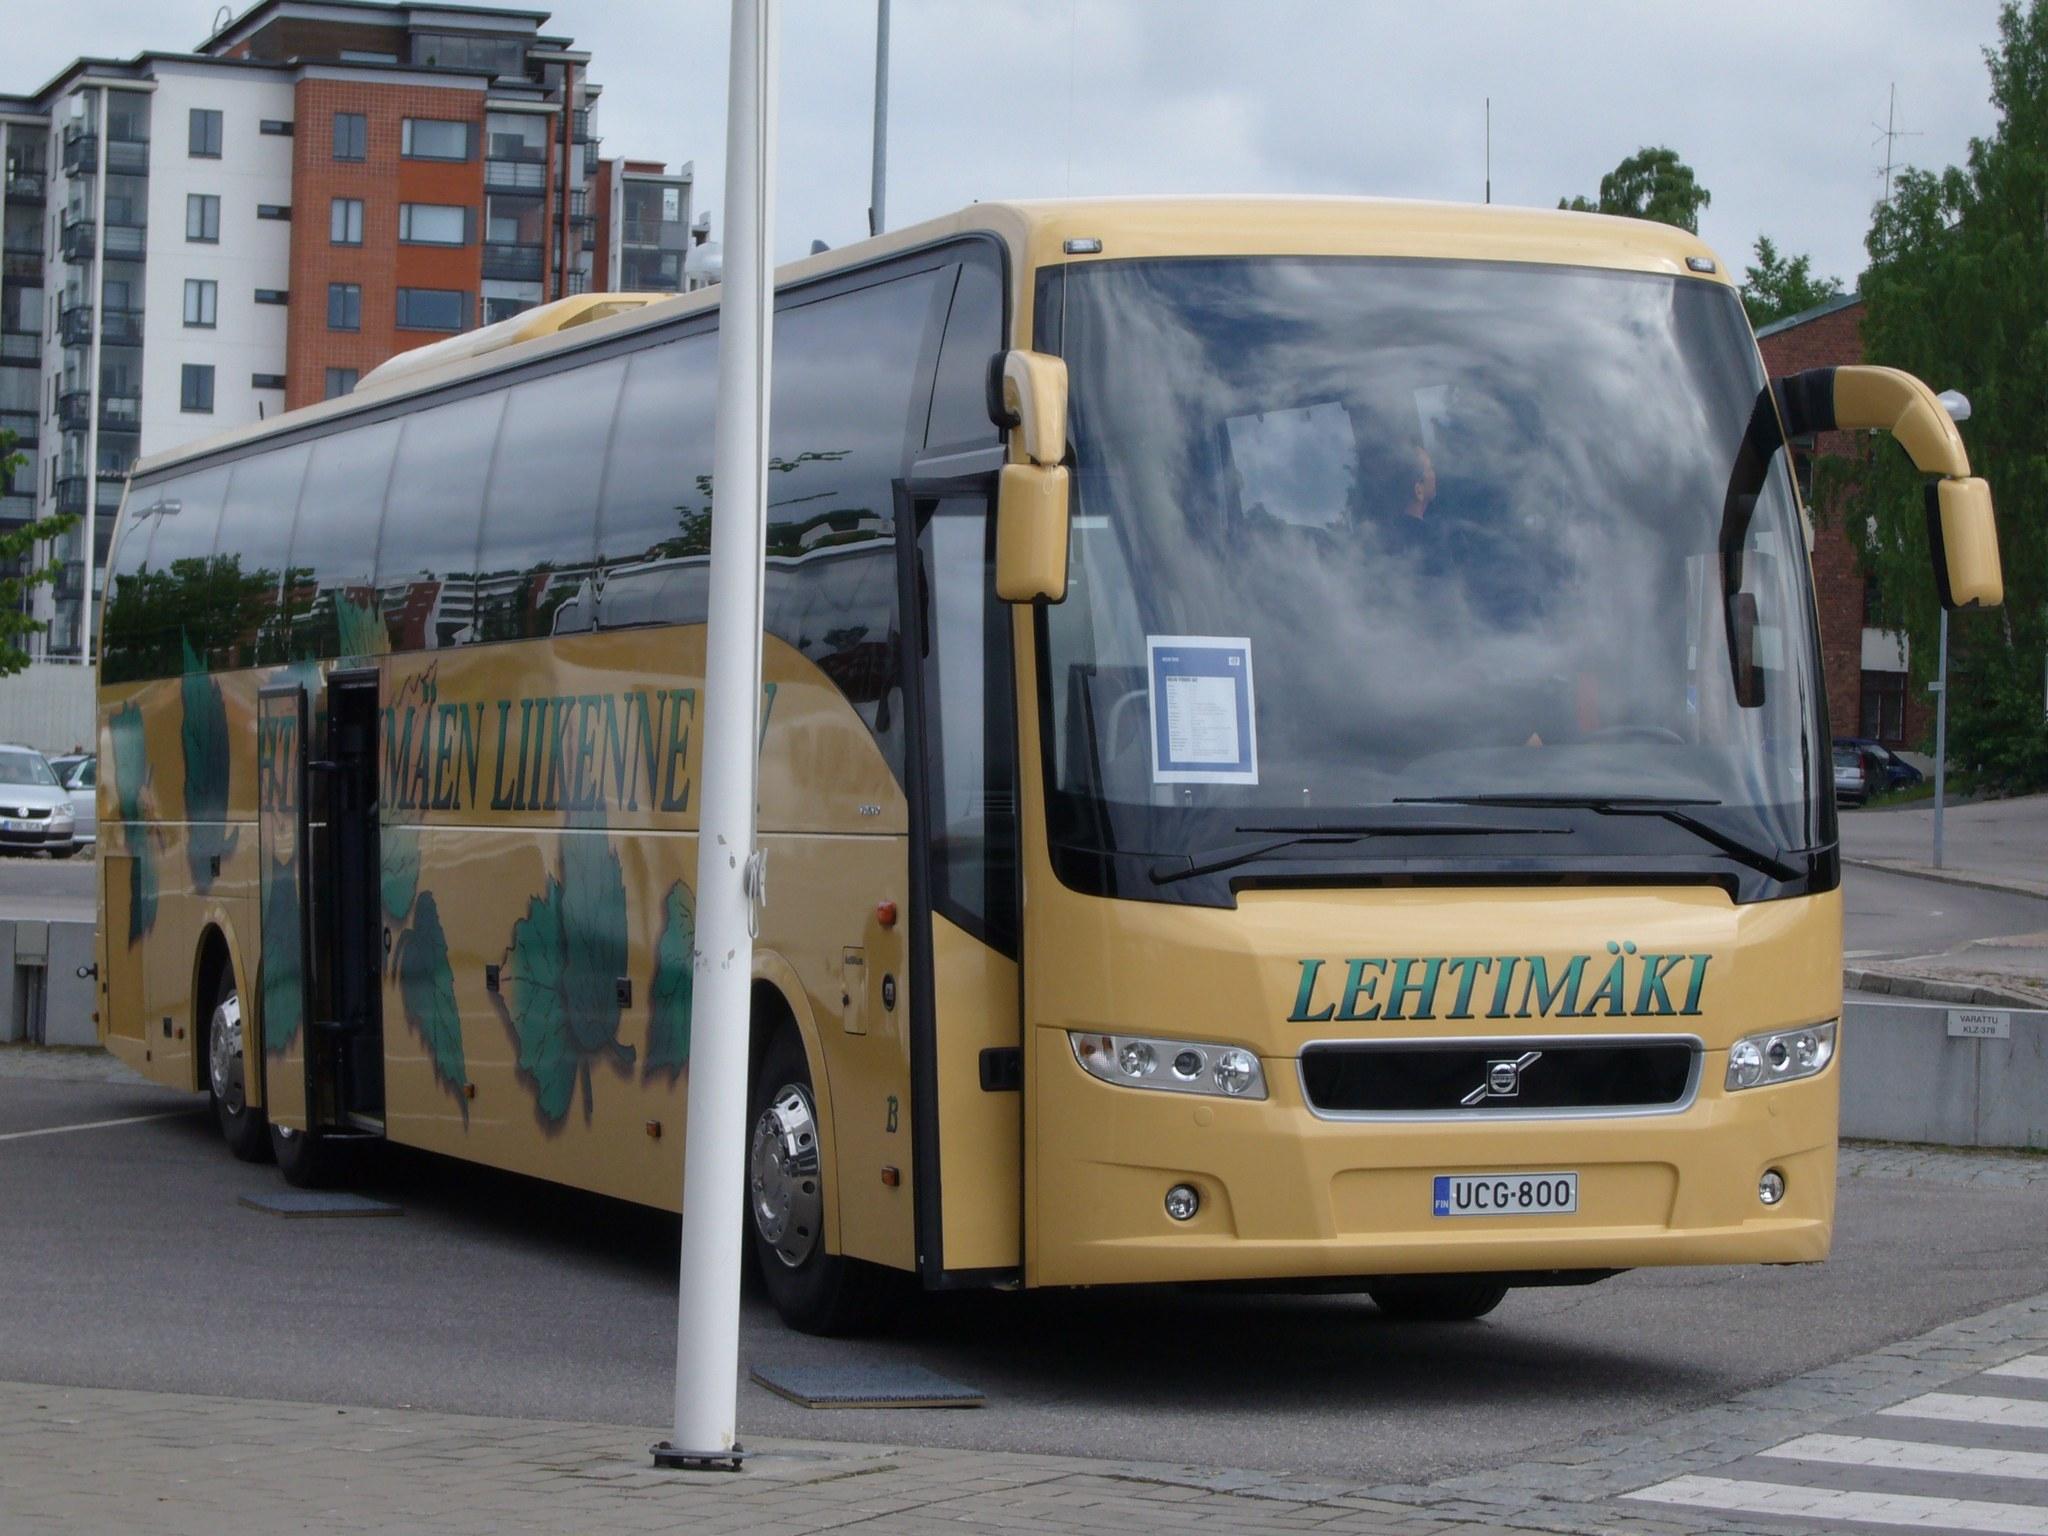 P1080291 Volvo Bus P Application Form on school bus, nabi bus, man bus, custom classic bus, honda bus, iveco bus, lion bus, scania bus, toyota bus, kia bus, future bus, hino bus, volkswagen bus, benz bus, chevrolet bus, dodge bus, mini bus, isuzu bus, sr travels bangladesh bus, force motors bus,